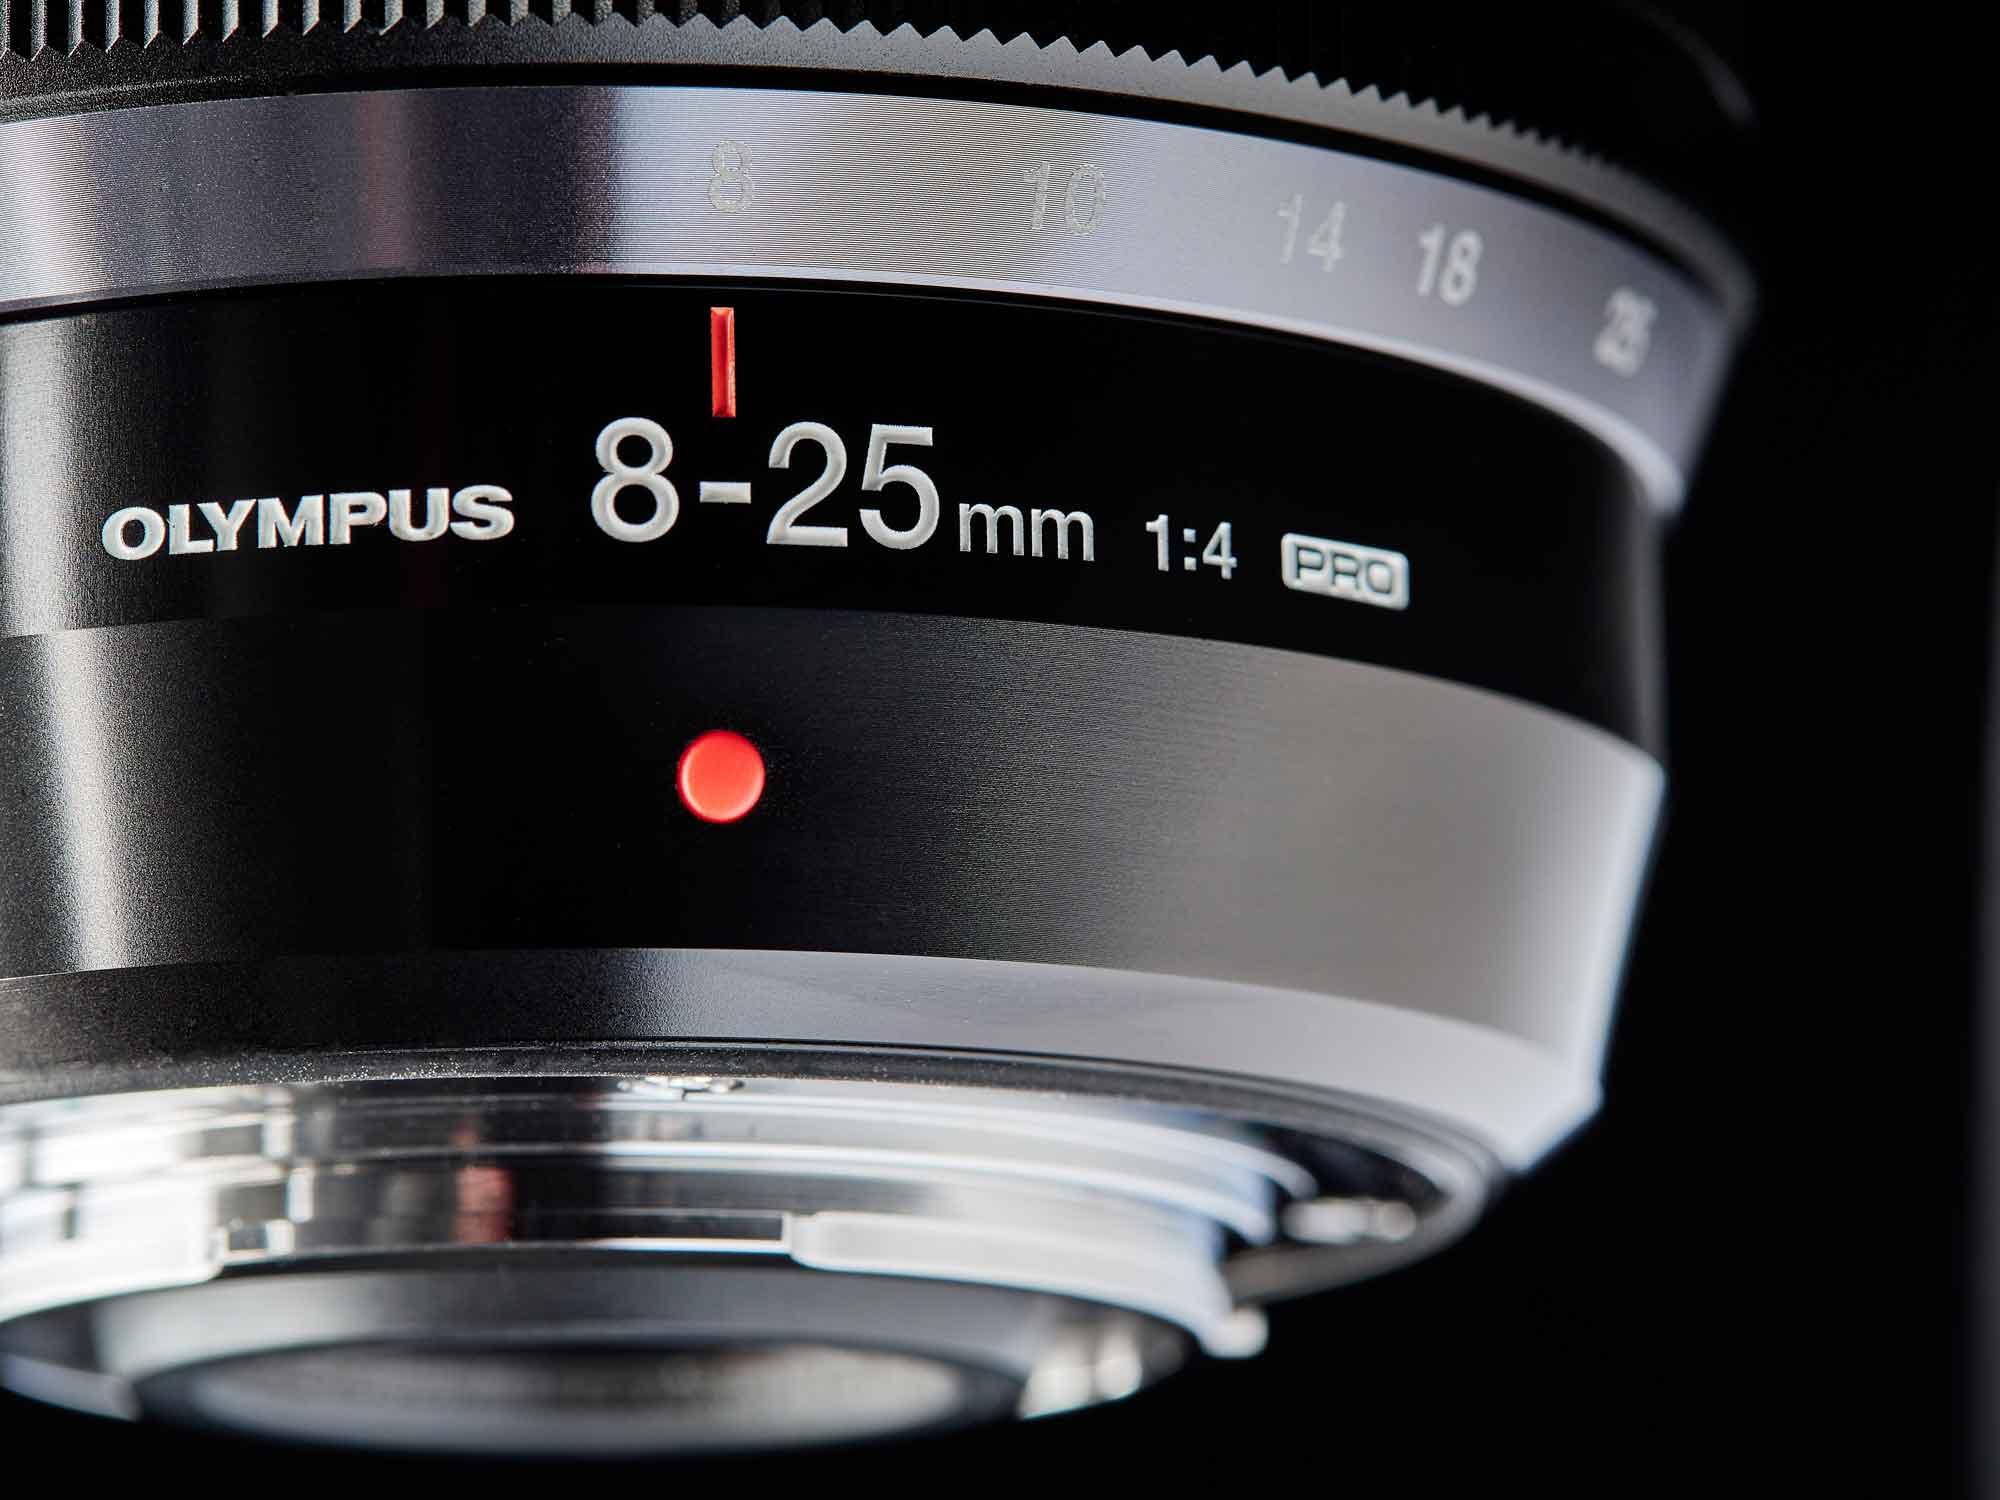 Olympus Weitwinkelobjektiv 8-25mm